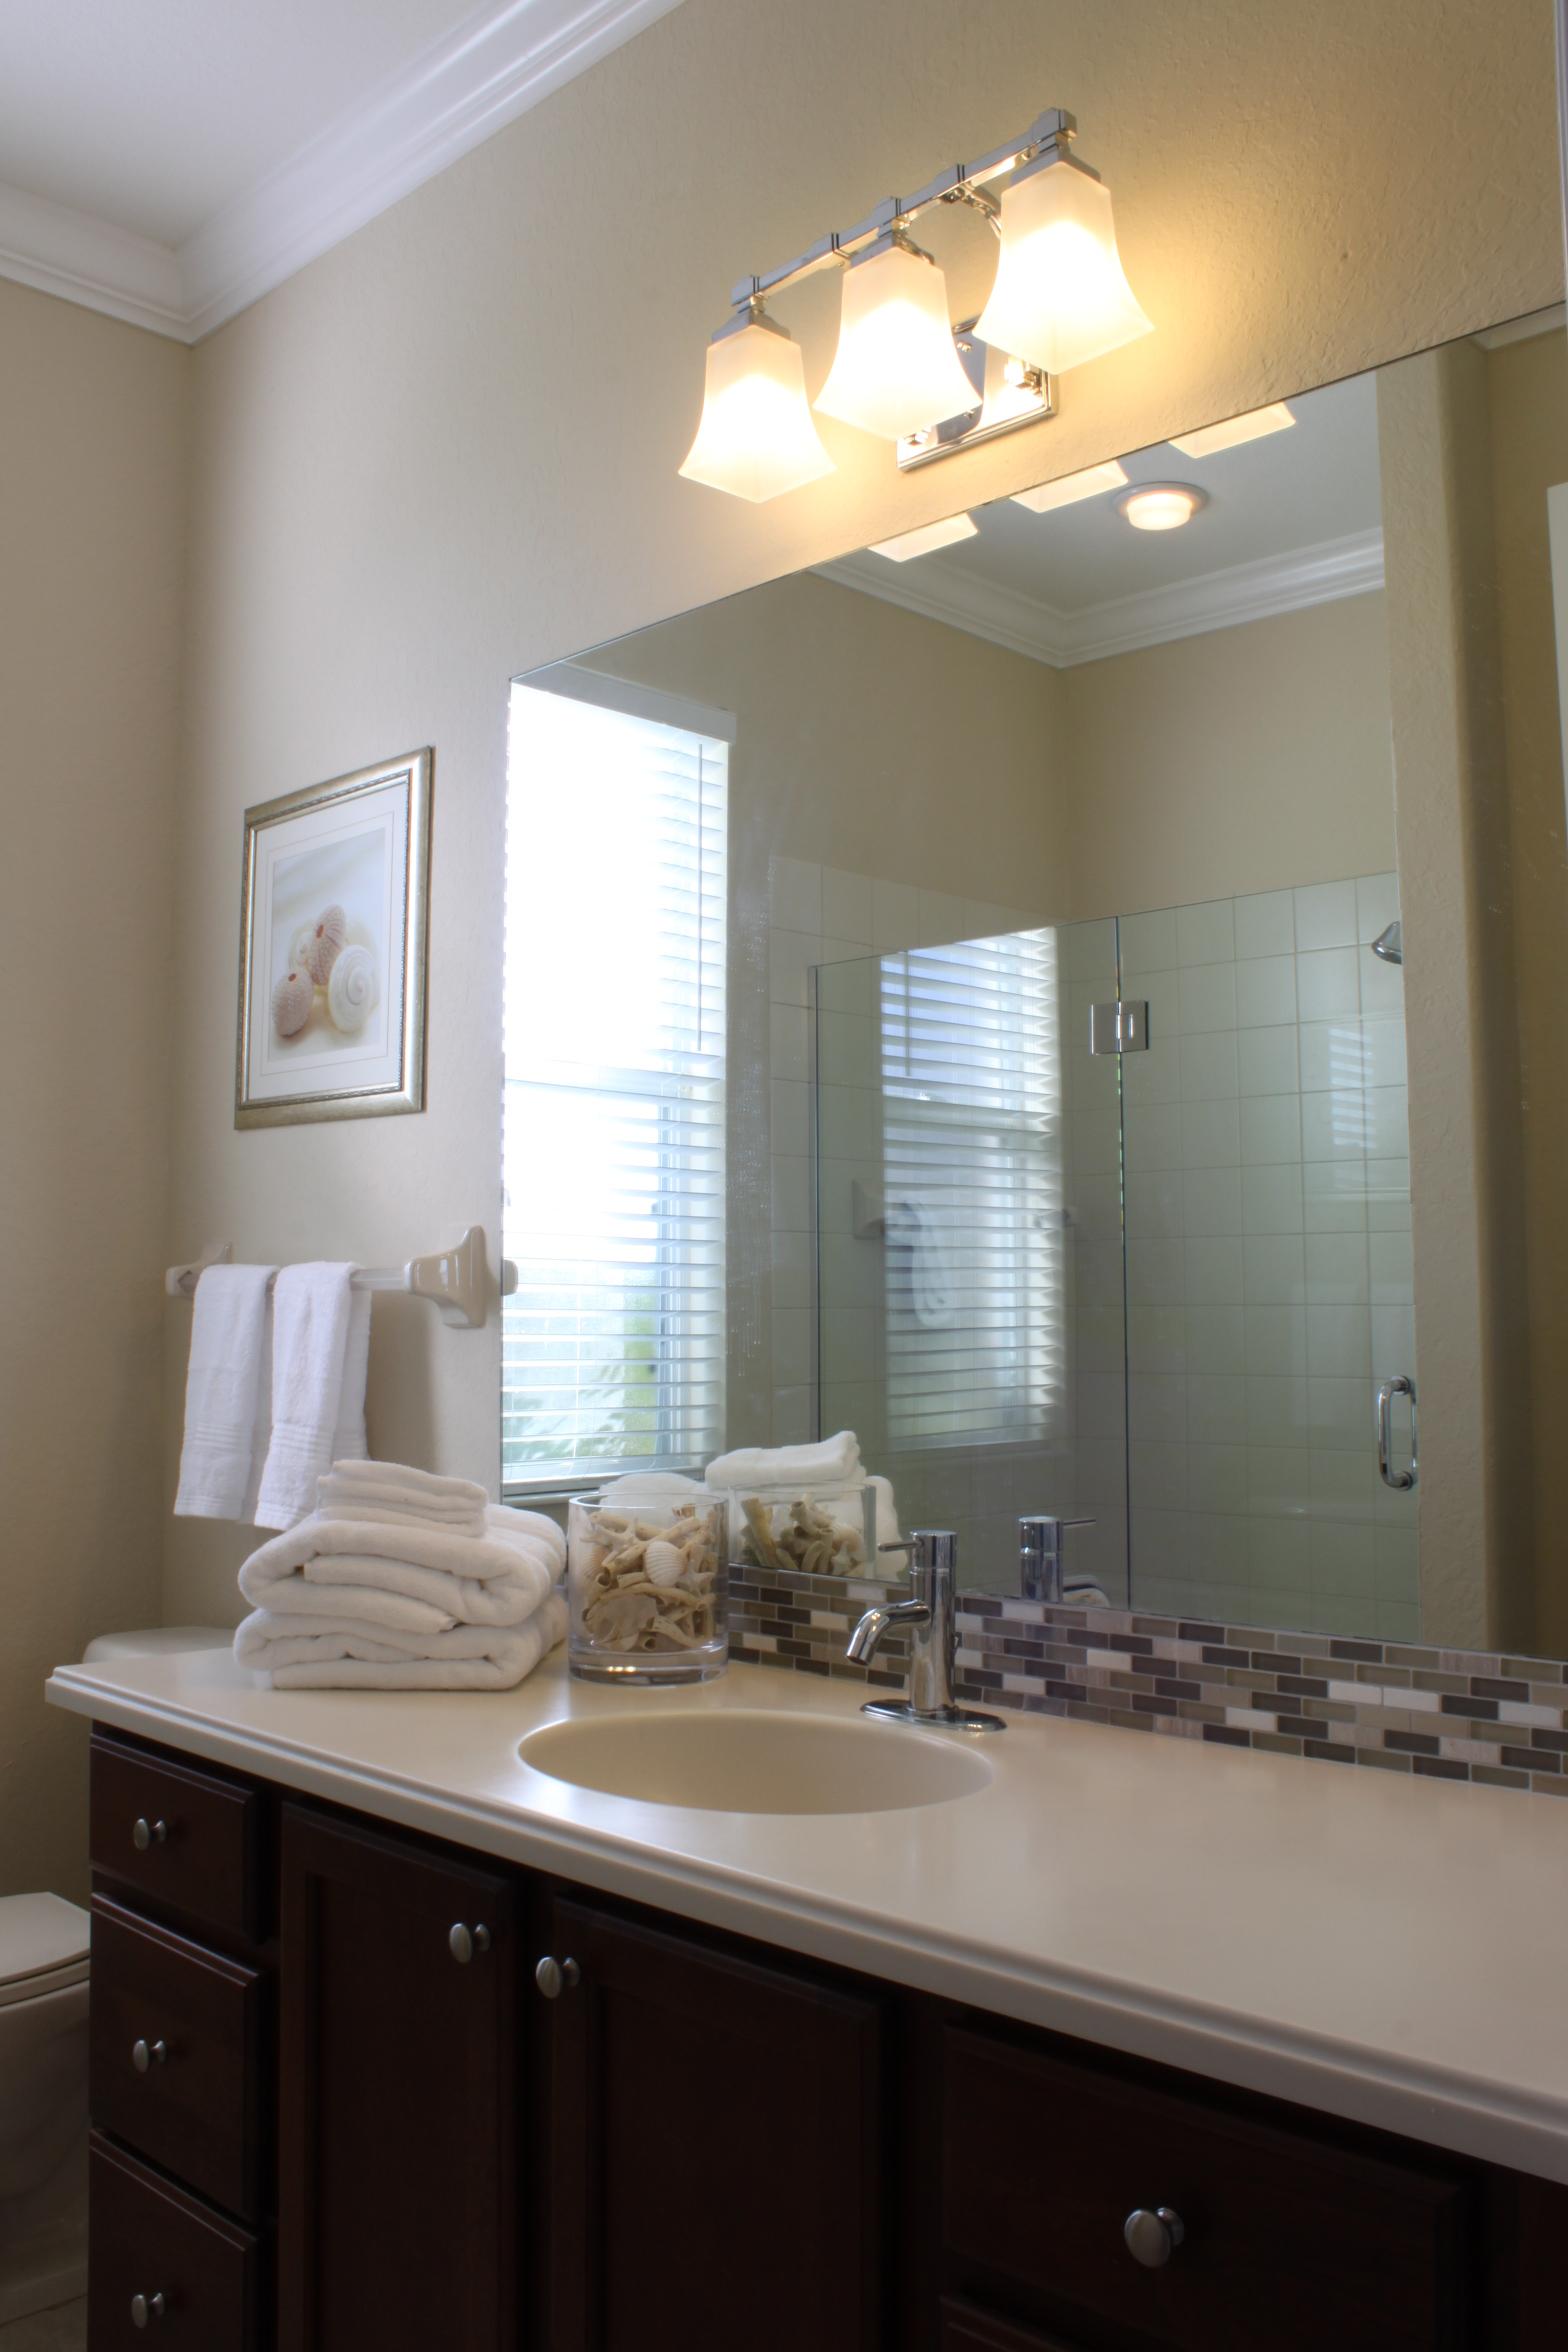 Tiled Backsplash Handyman Examples Beaches Home Services